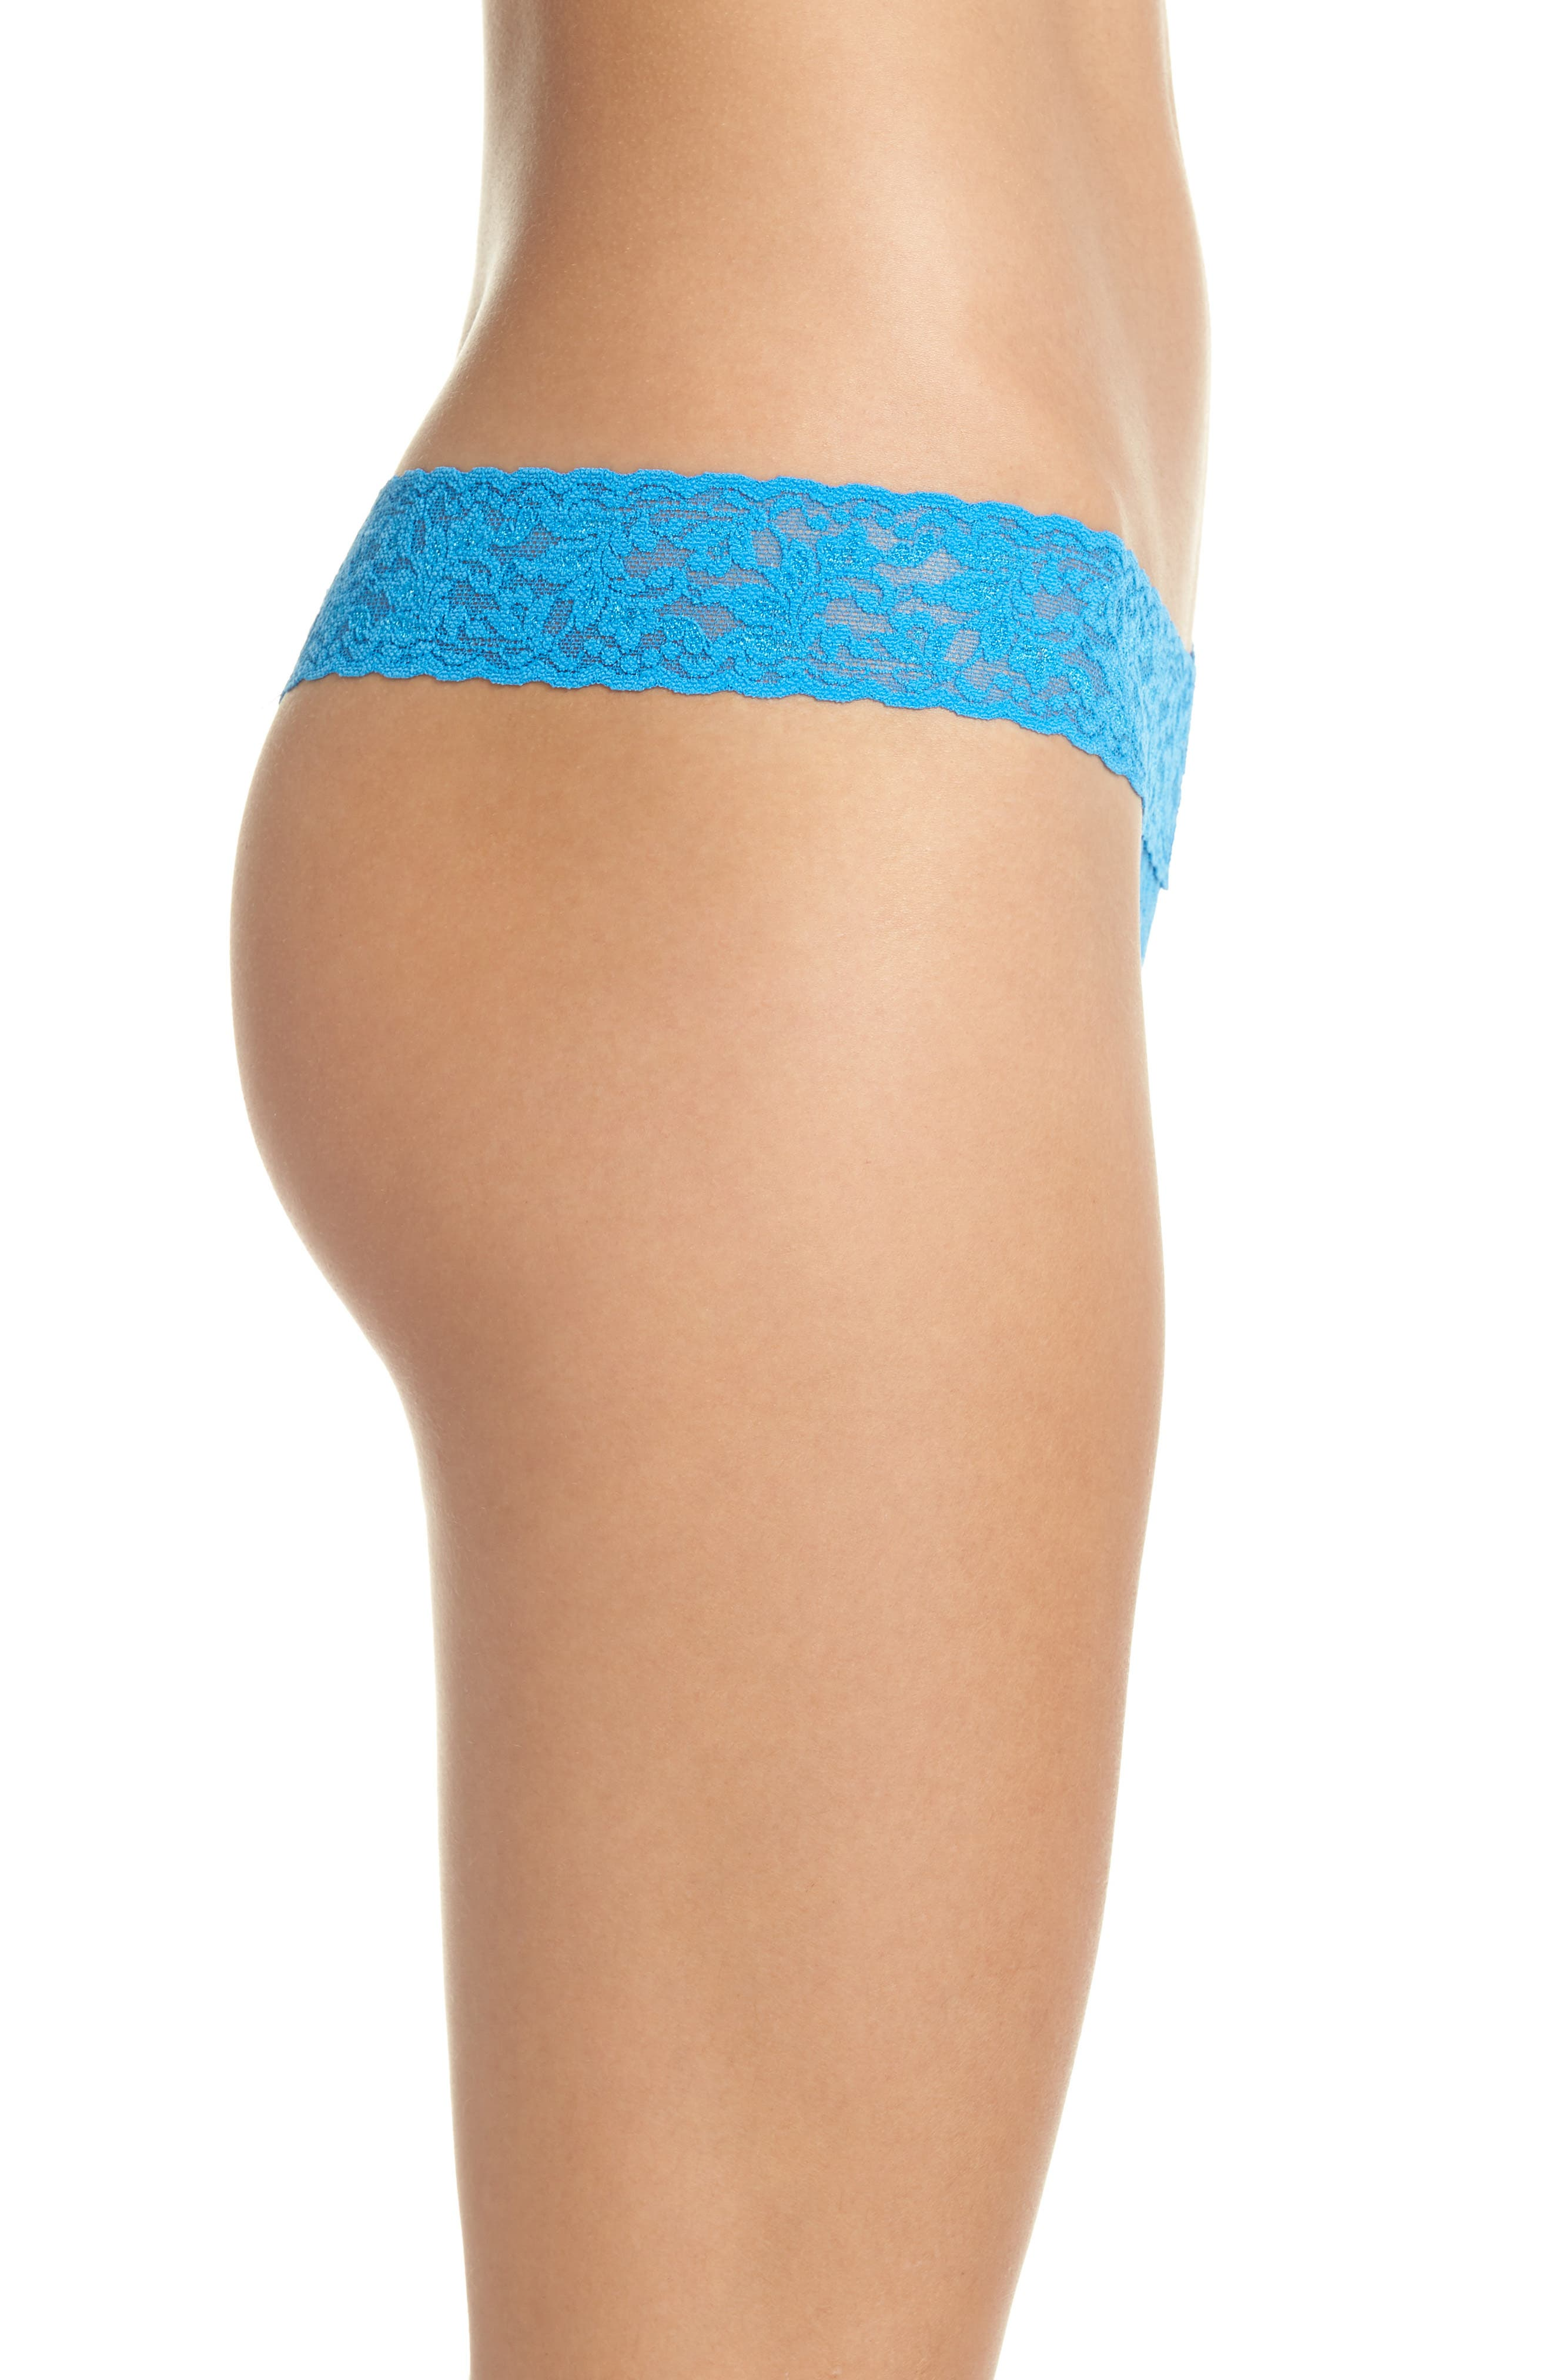 Signature Lace Low Rise Thong,                             Alternate thumbnail 3, color,                             LAGUNA BLUE